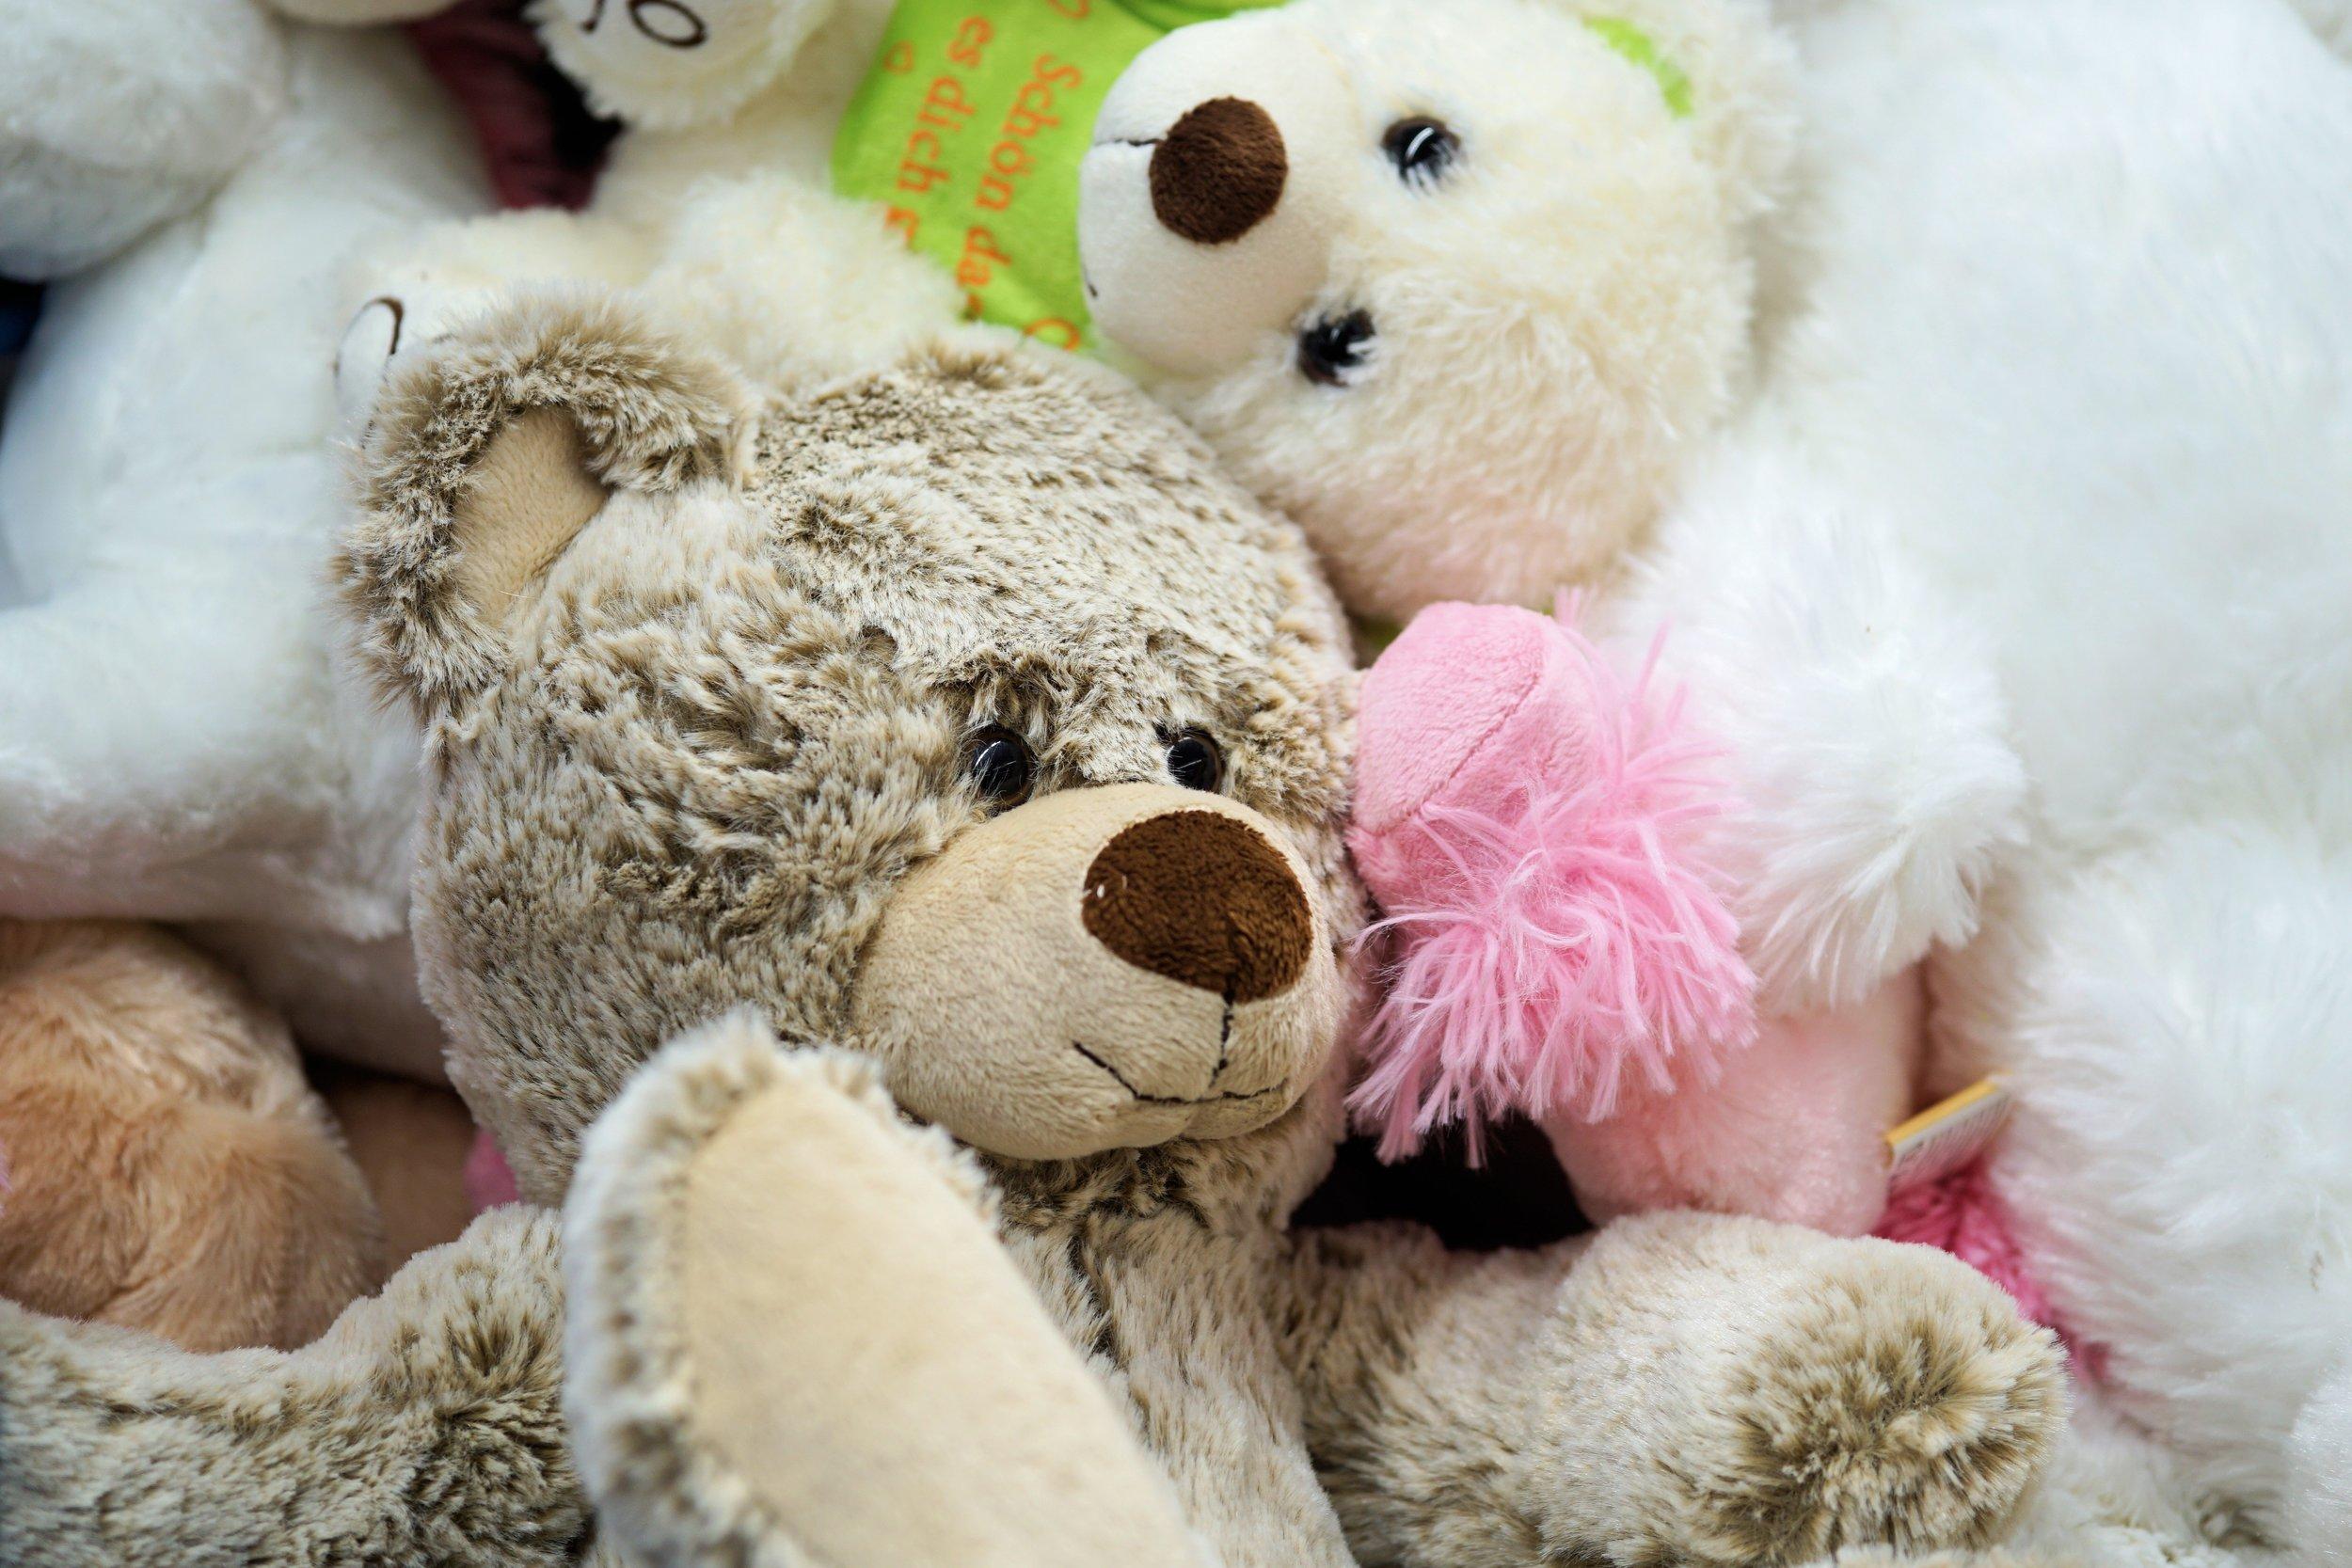 adorable-bears-child-357309.jpg